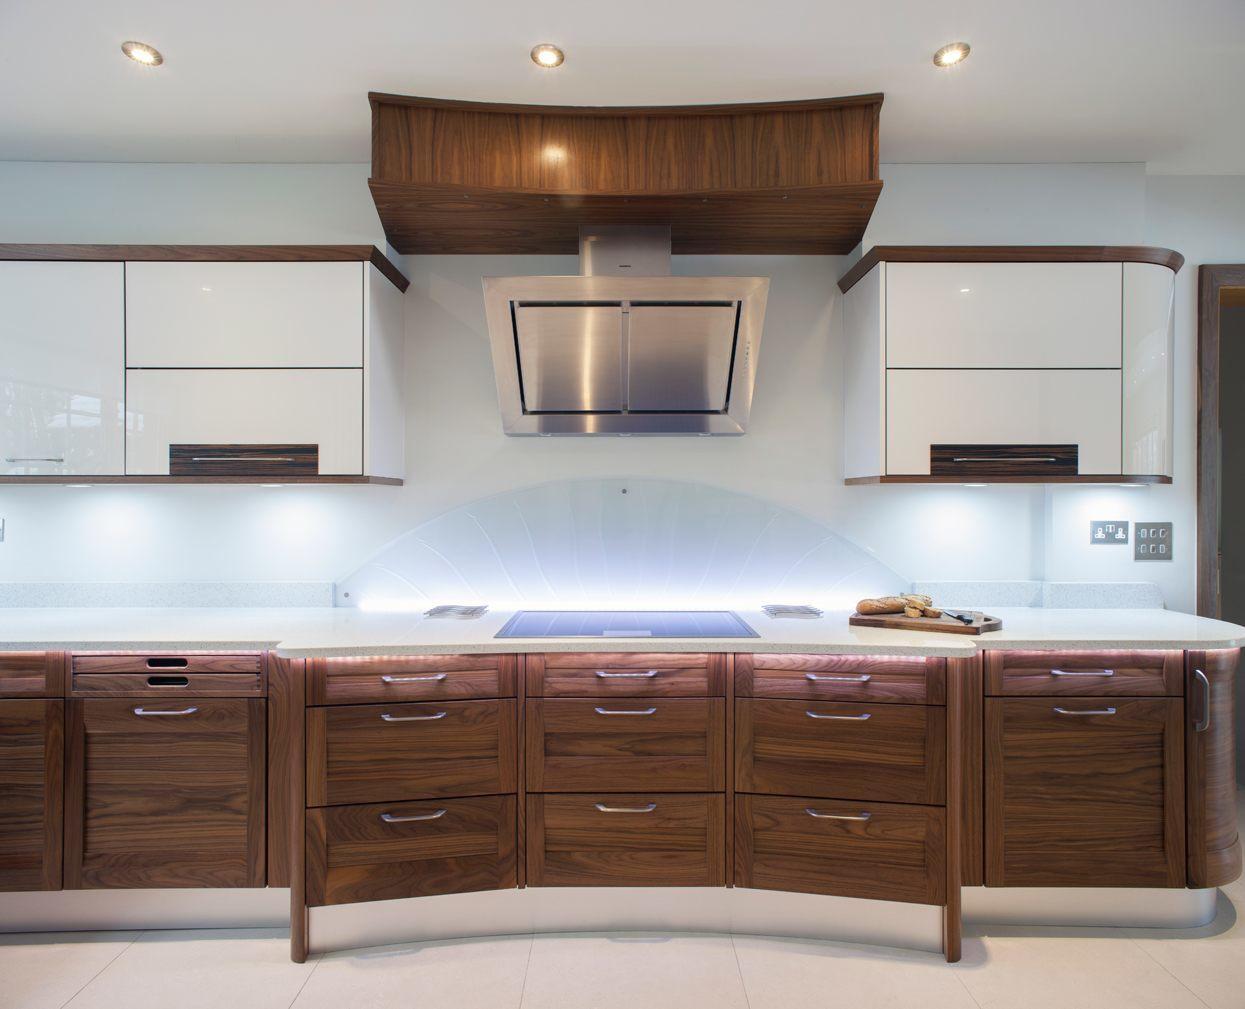 designer kitchens London